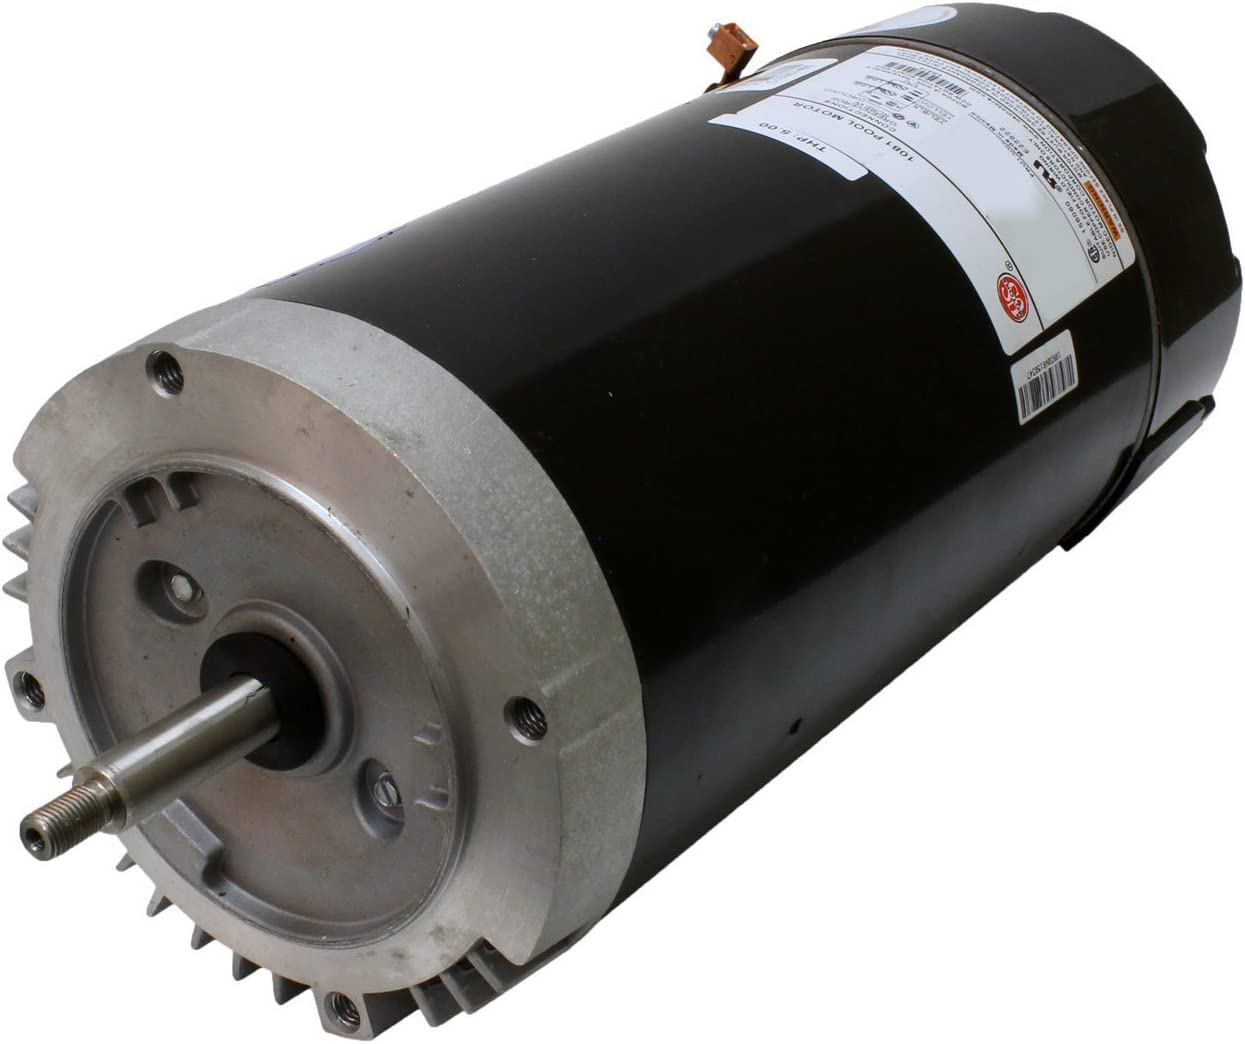 Pool Motor, 3/4 HP, 3450 RPM, 115/208-230V